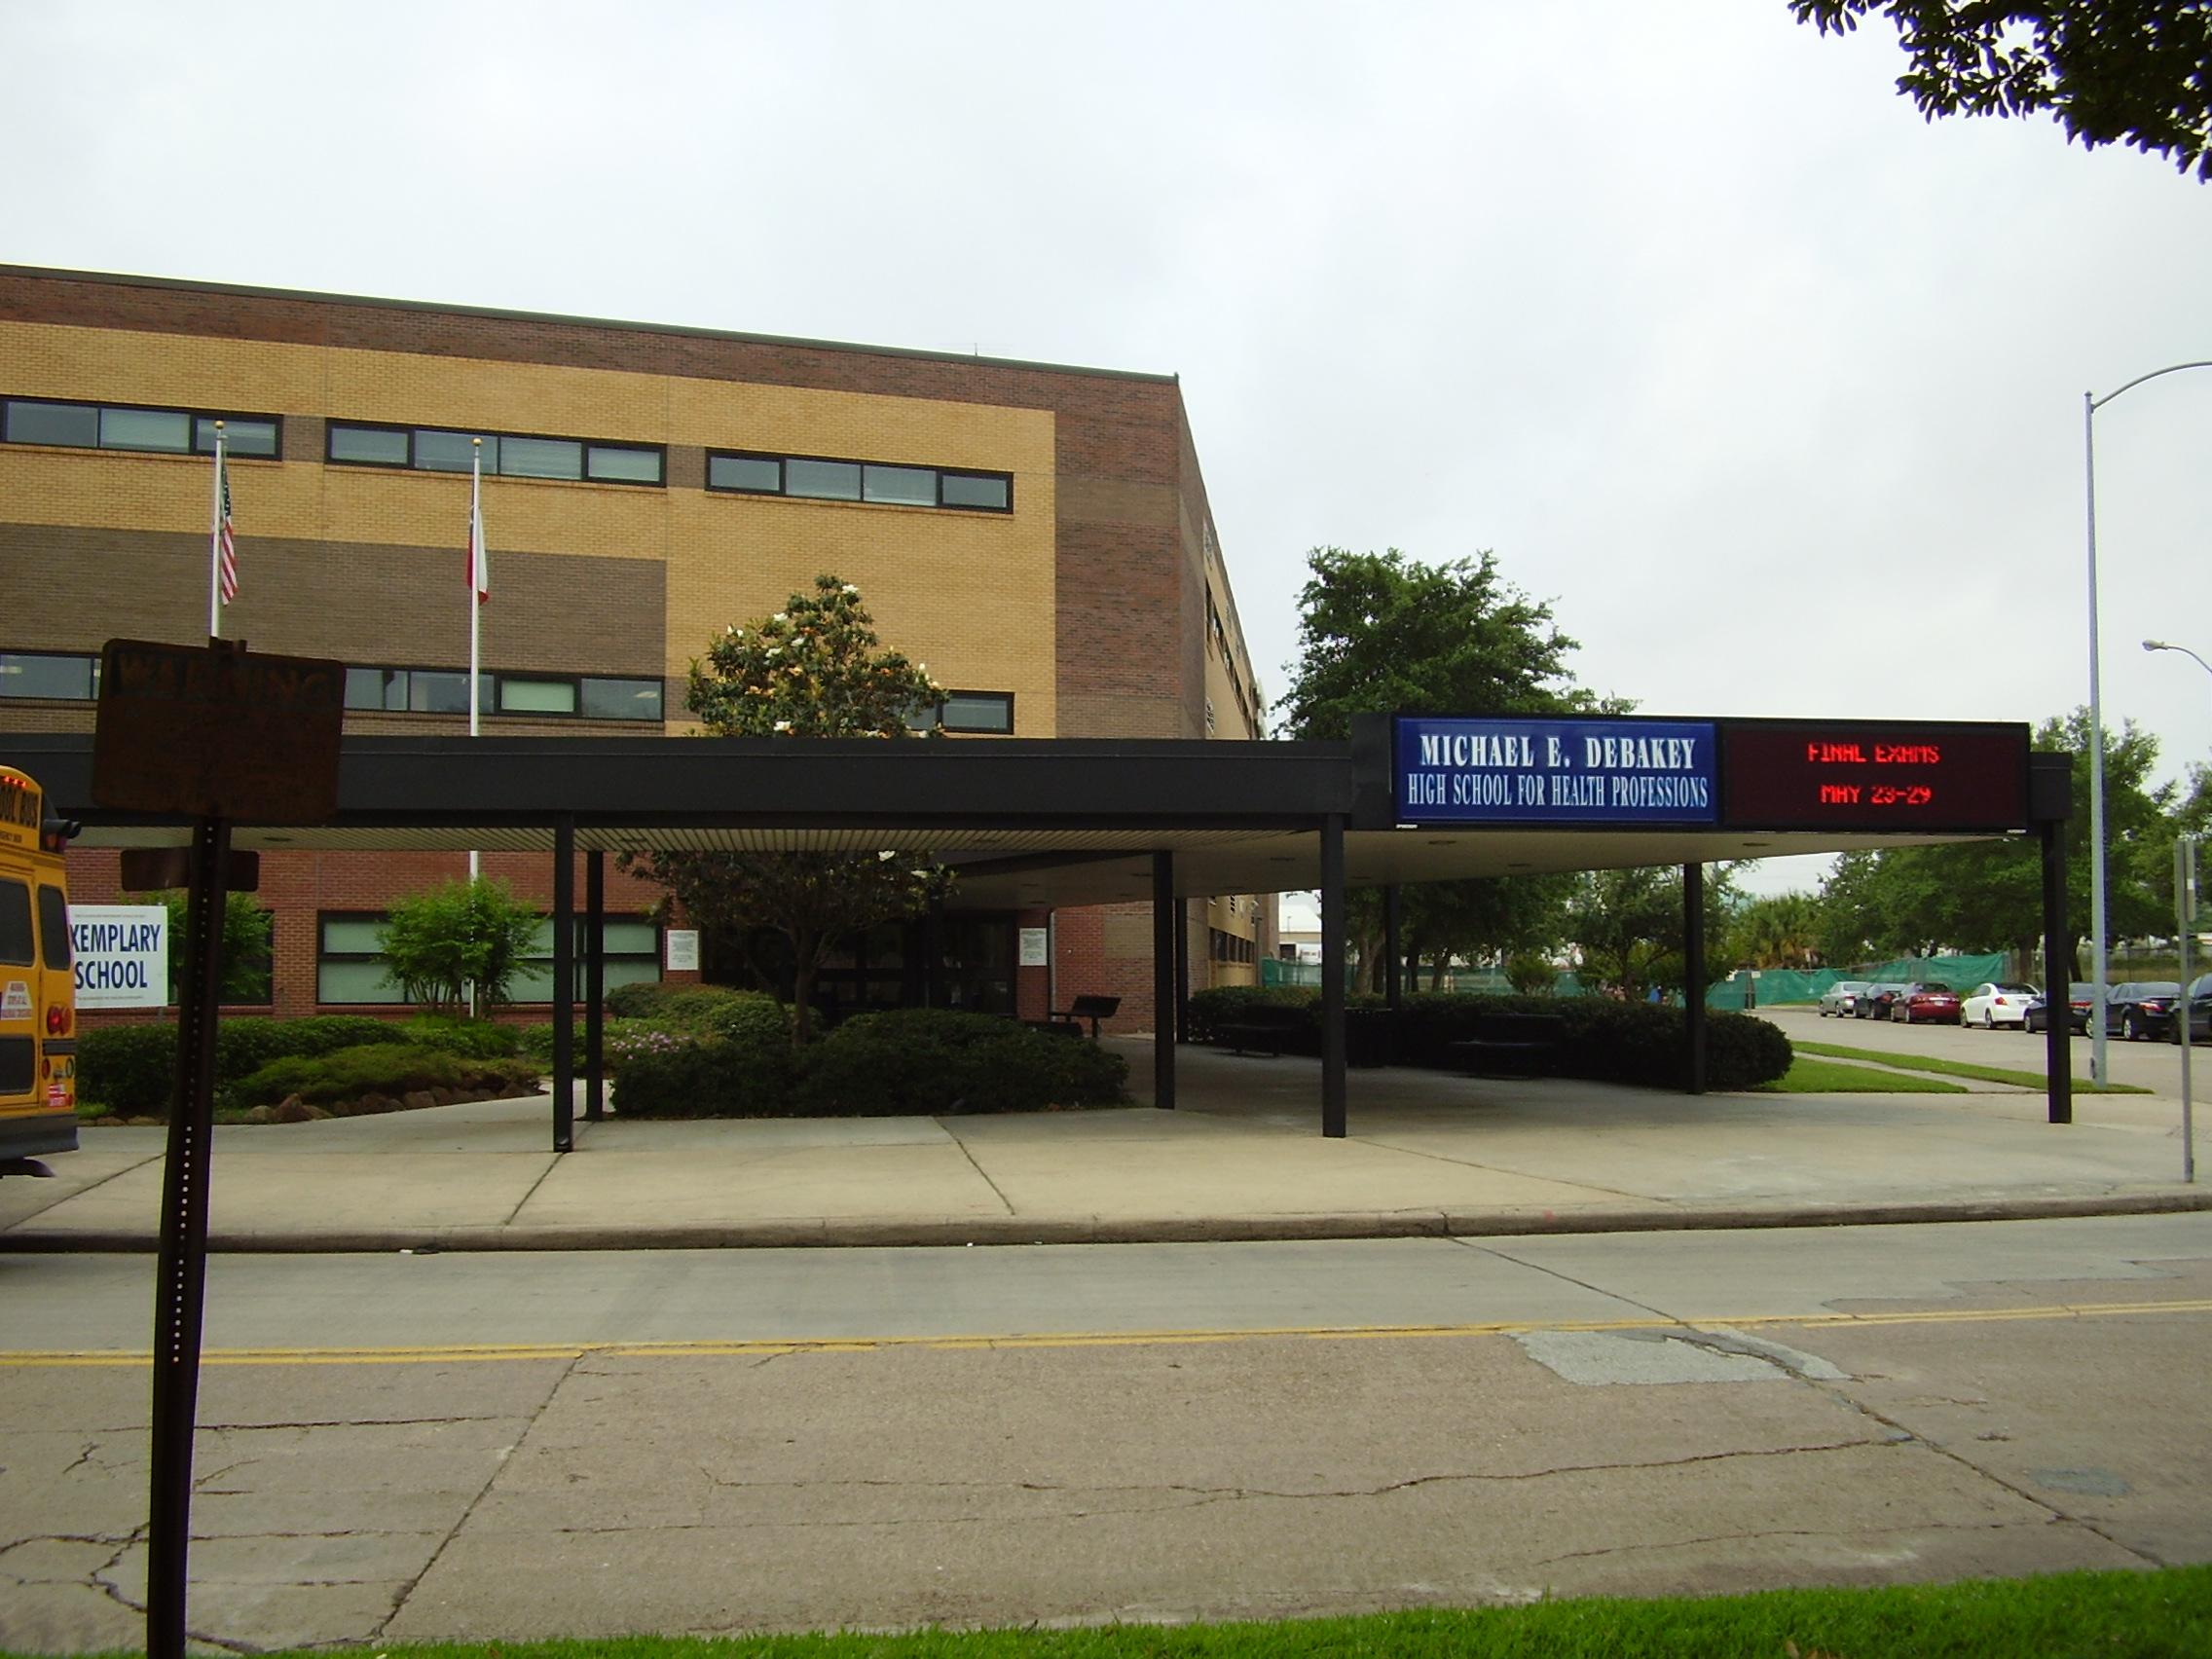 Debakey High School New Building